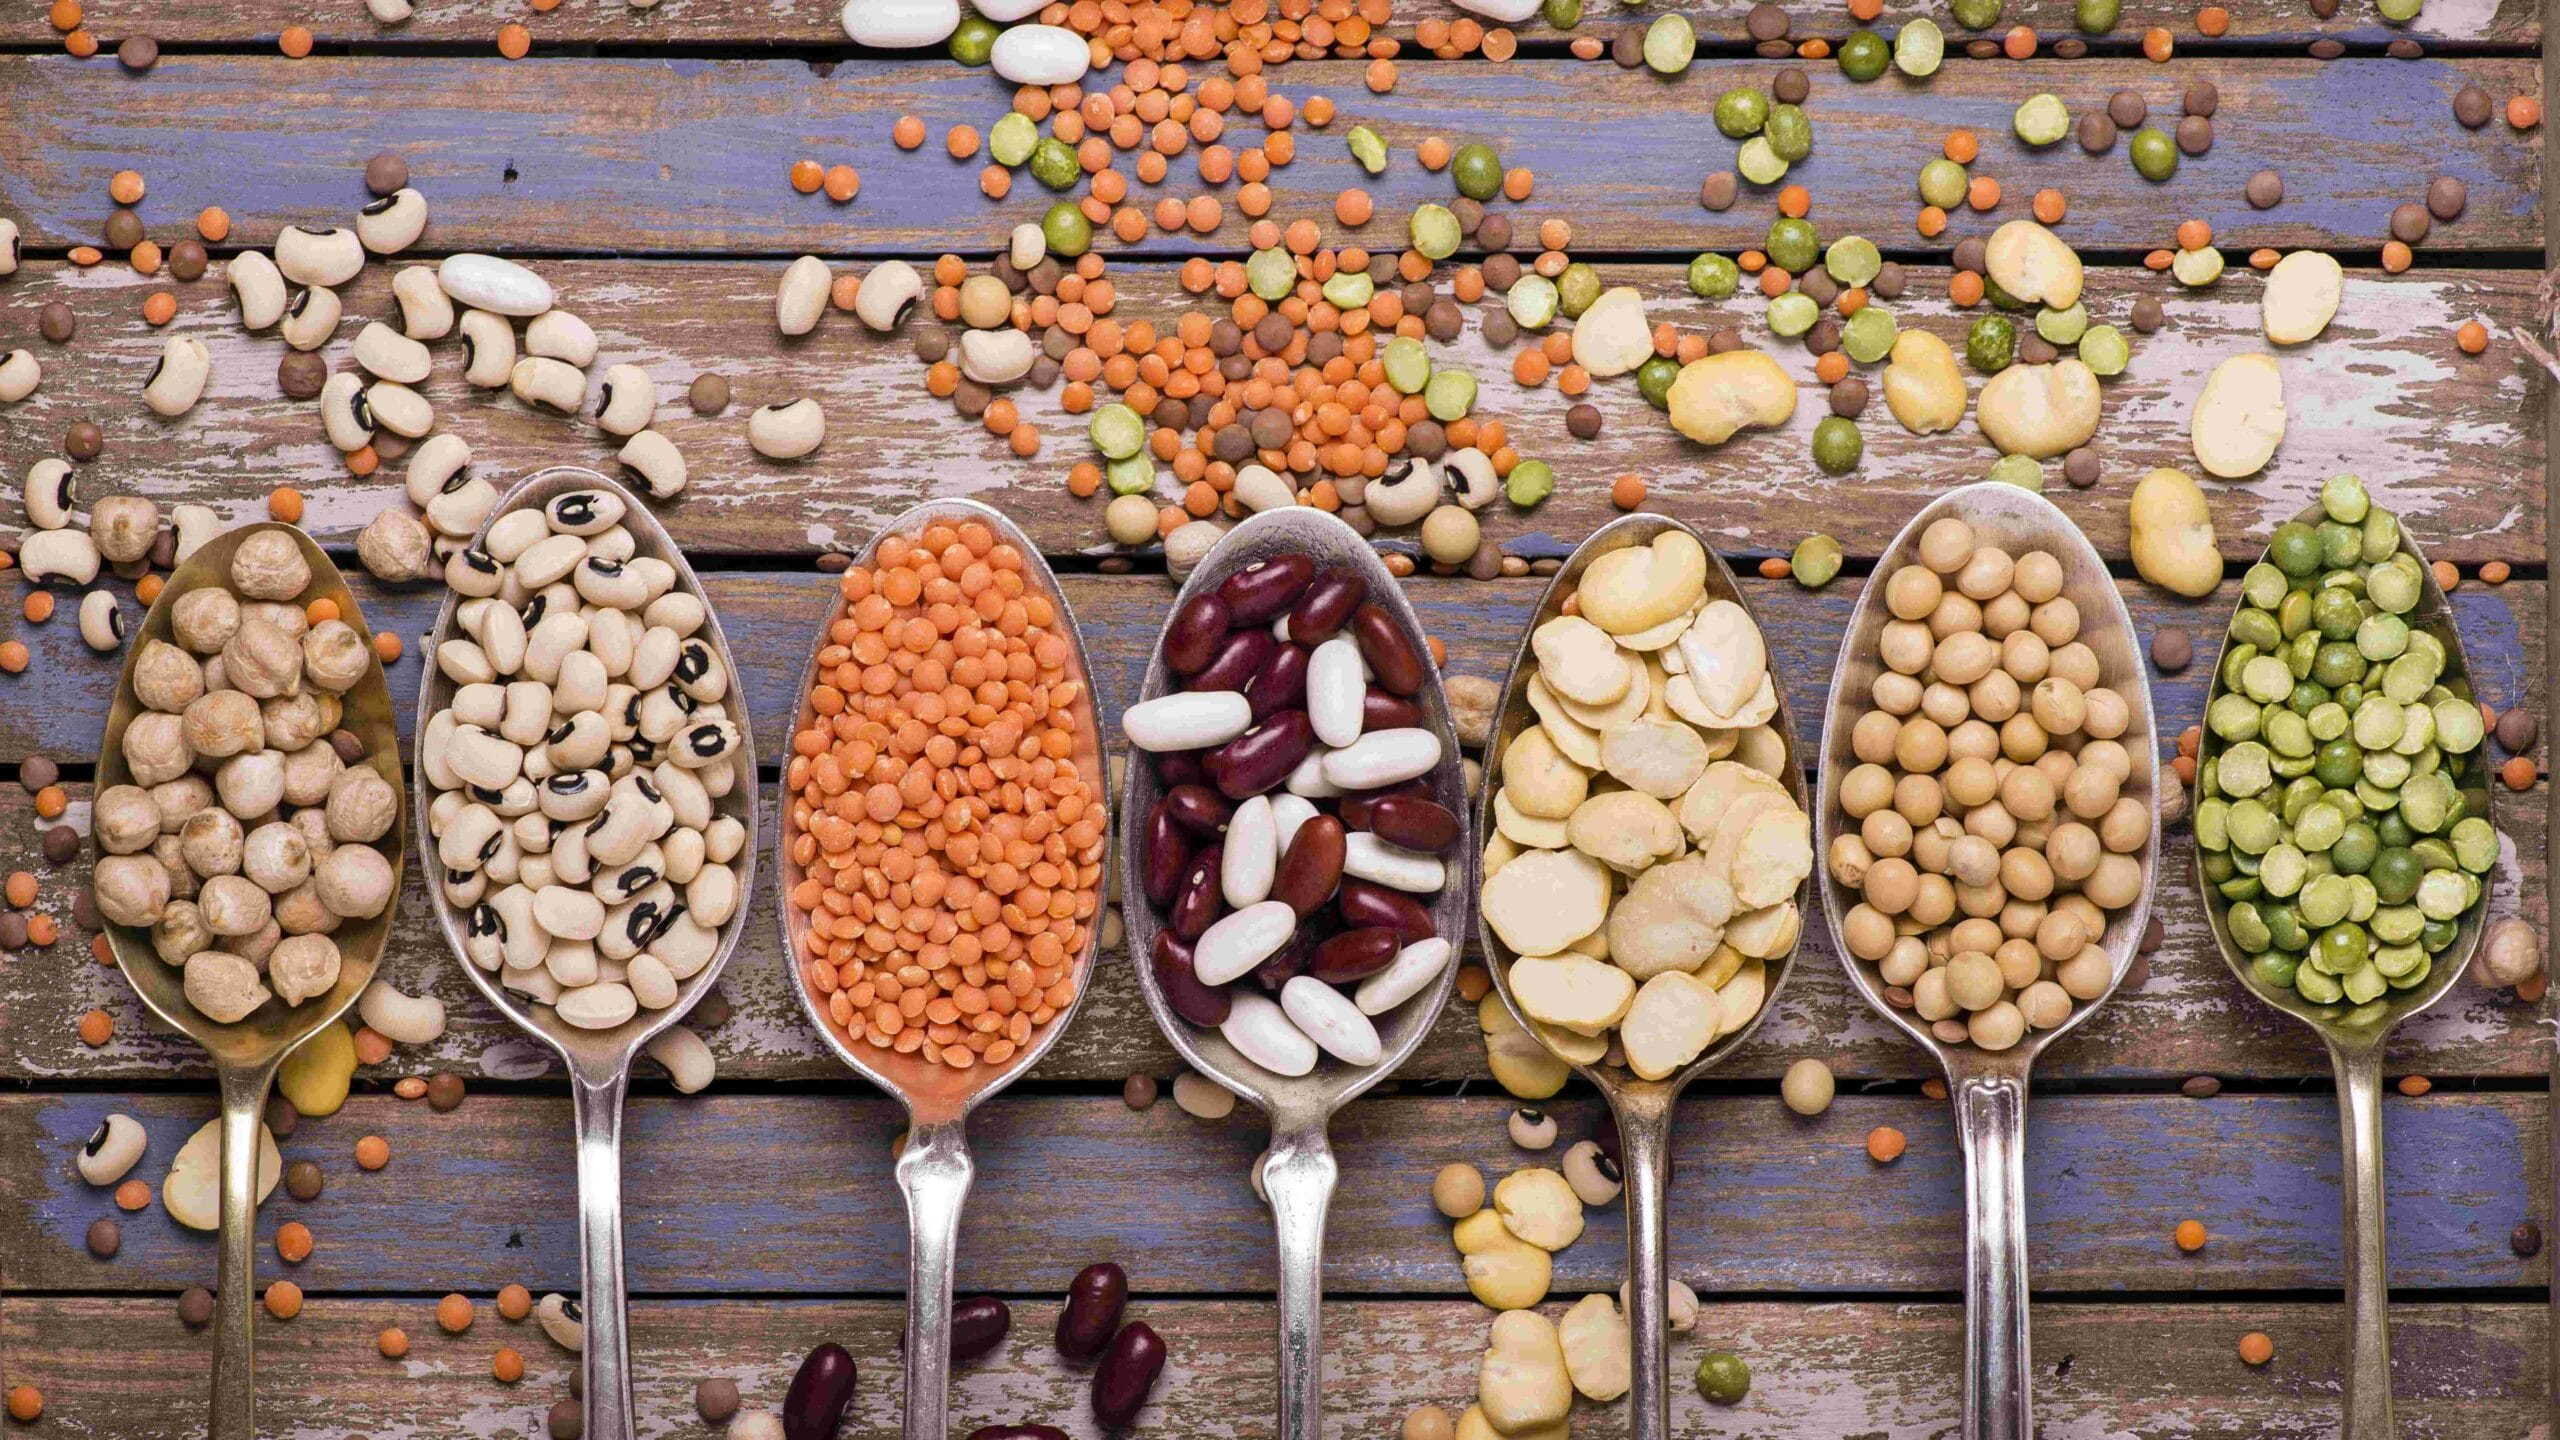 proteine nobili vegetali legumi cosa sono